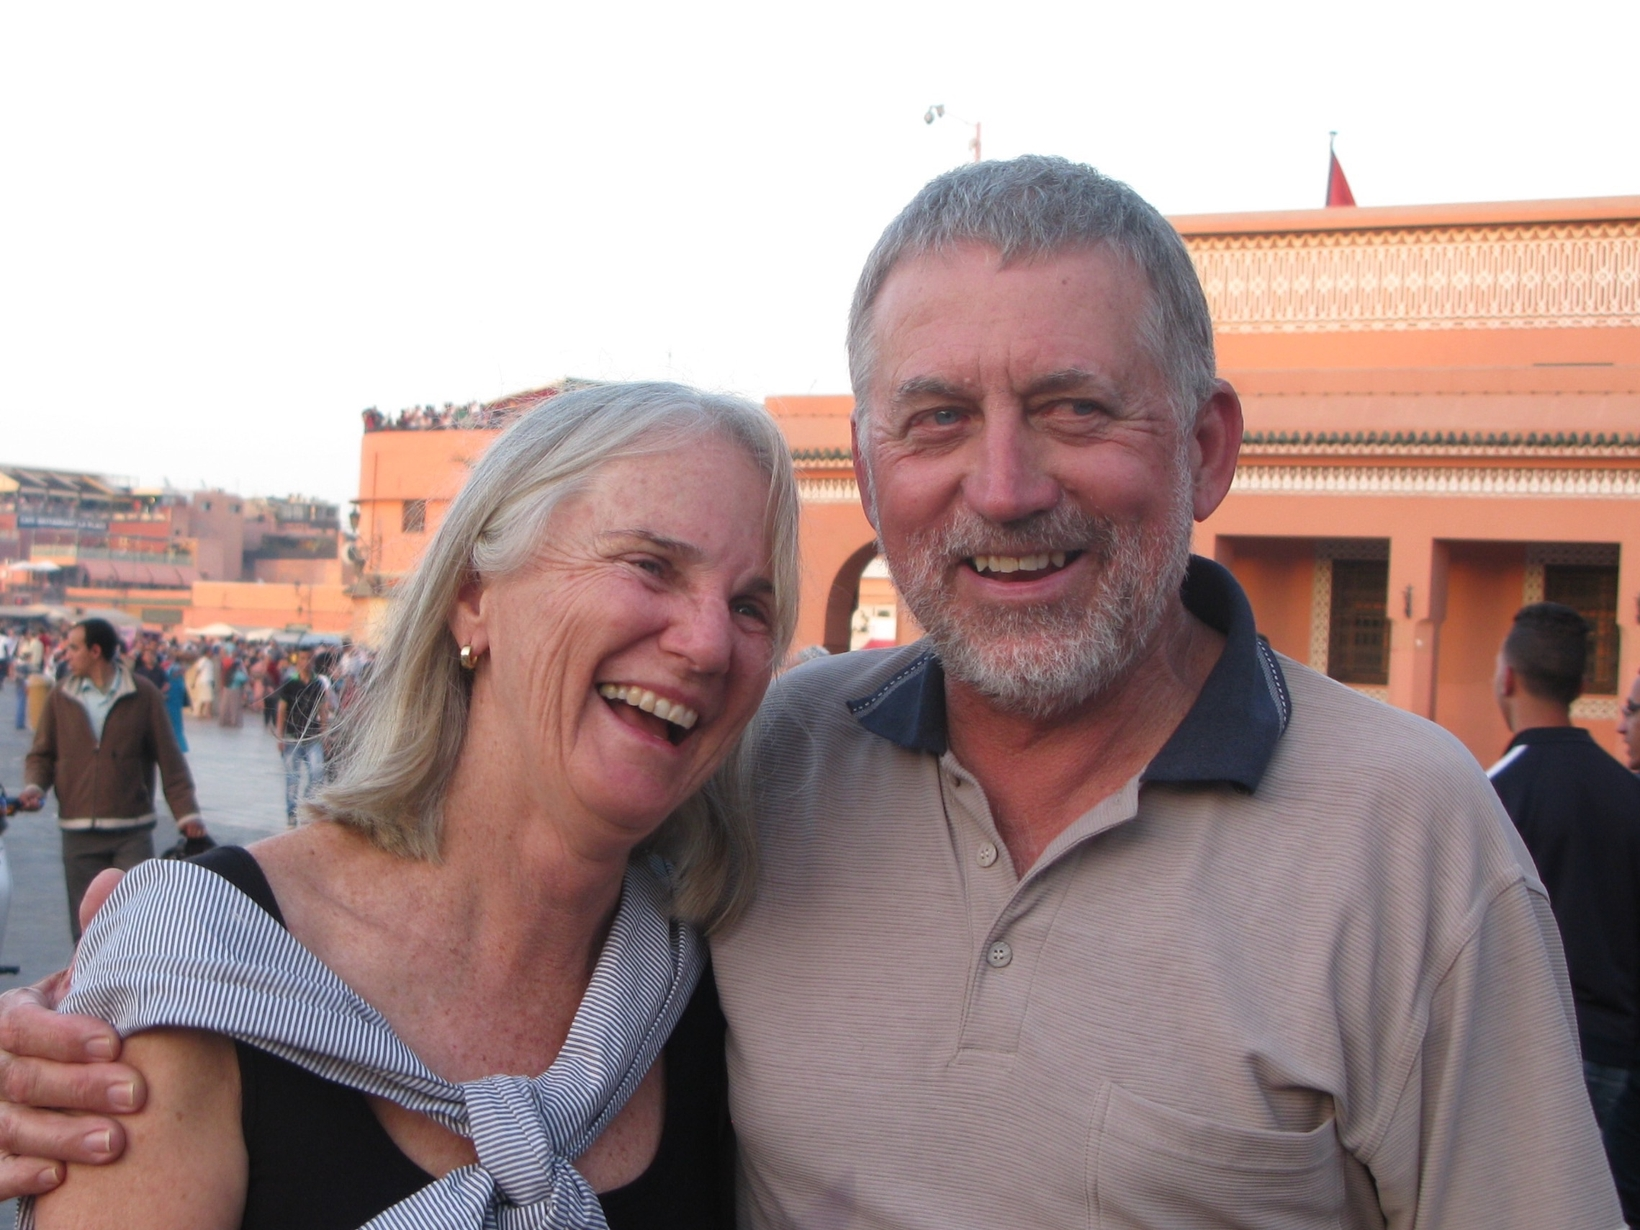 Deb & Garry from Sunshine Coast, Queensland, Australia